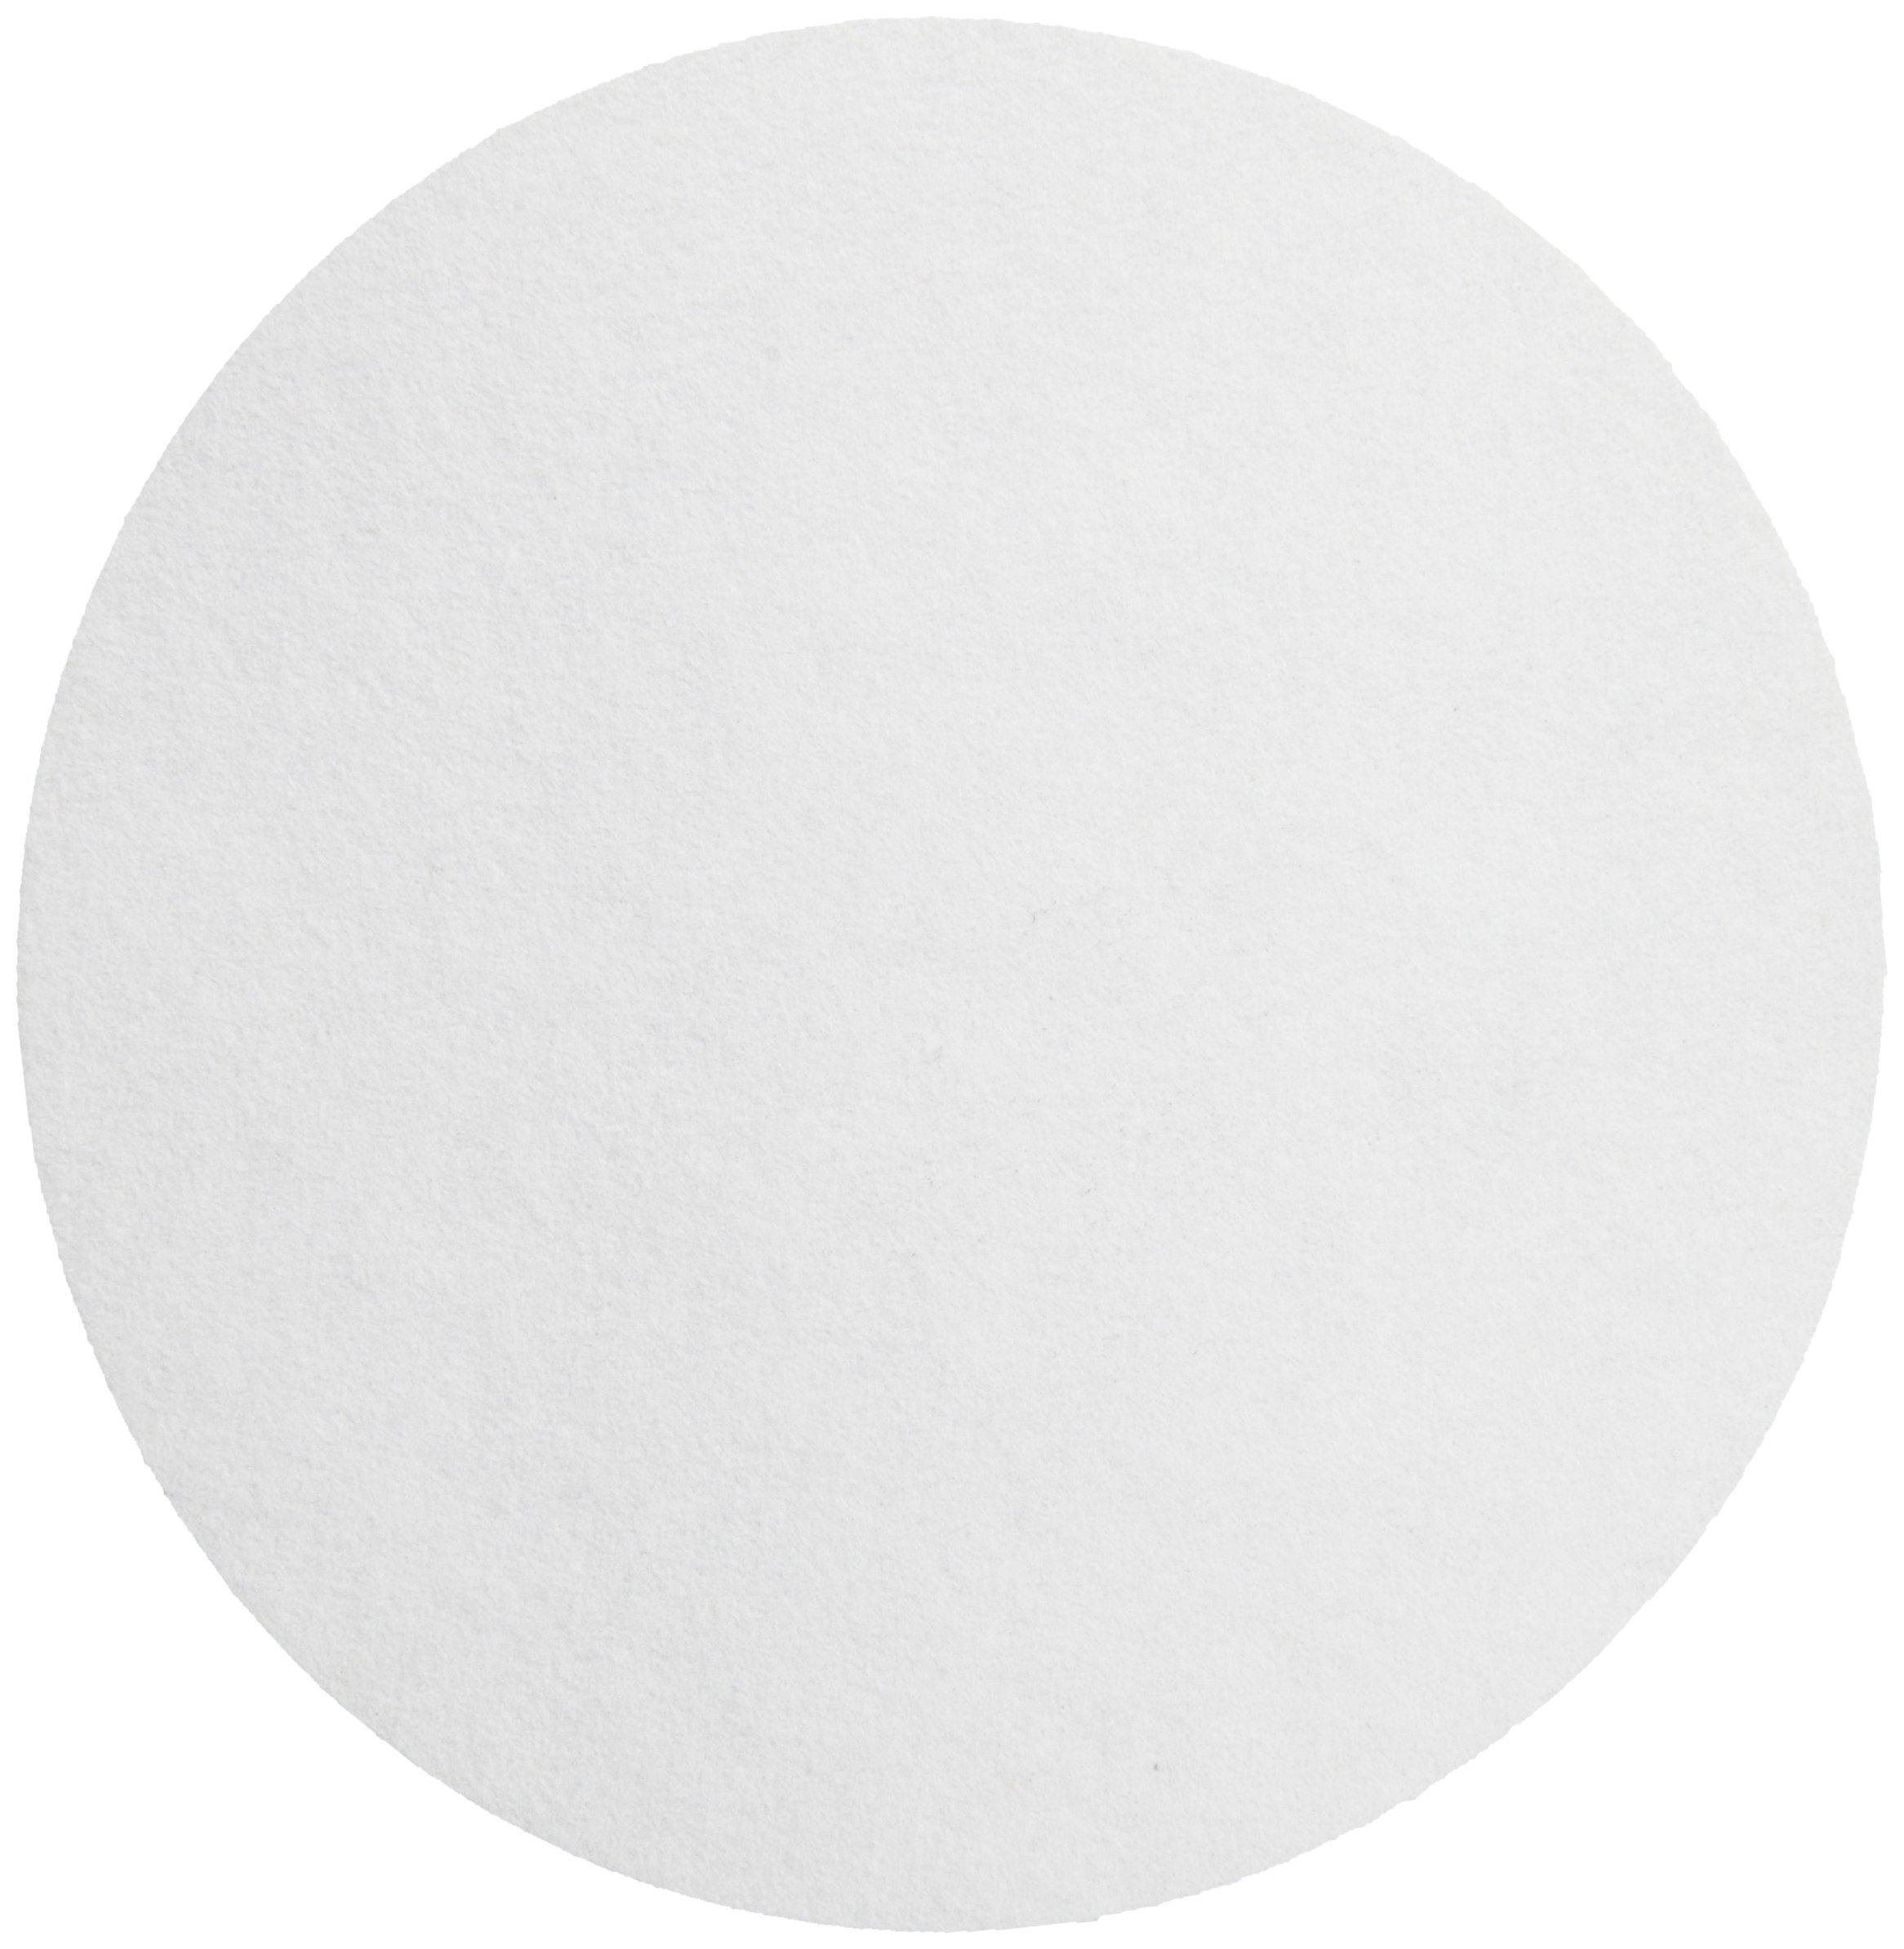 Whatman 1442-055 Quantitative Filter Paper Circles, 2.5 Micron, Grade 42, 55mm Diameter (Pack of 100)